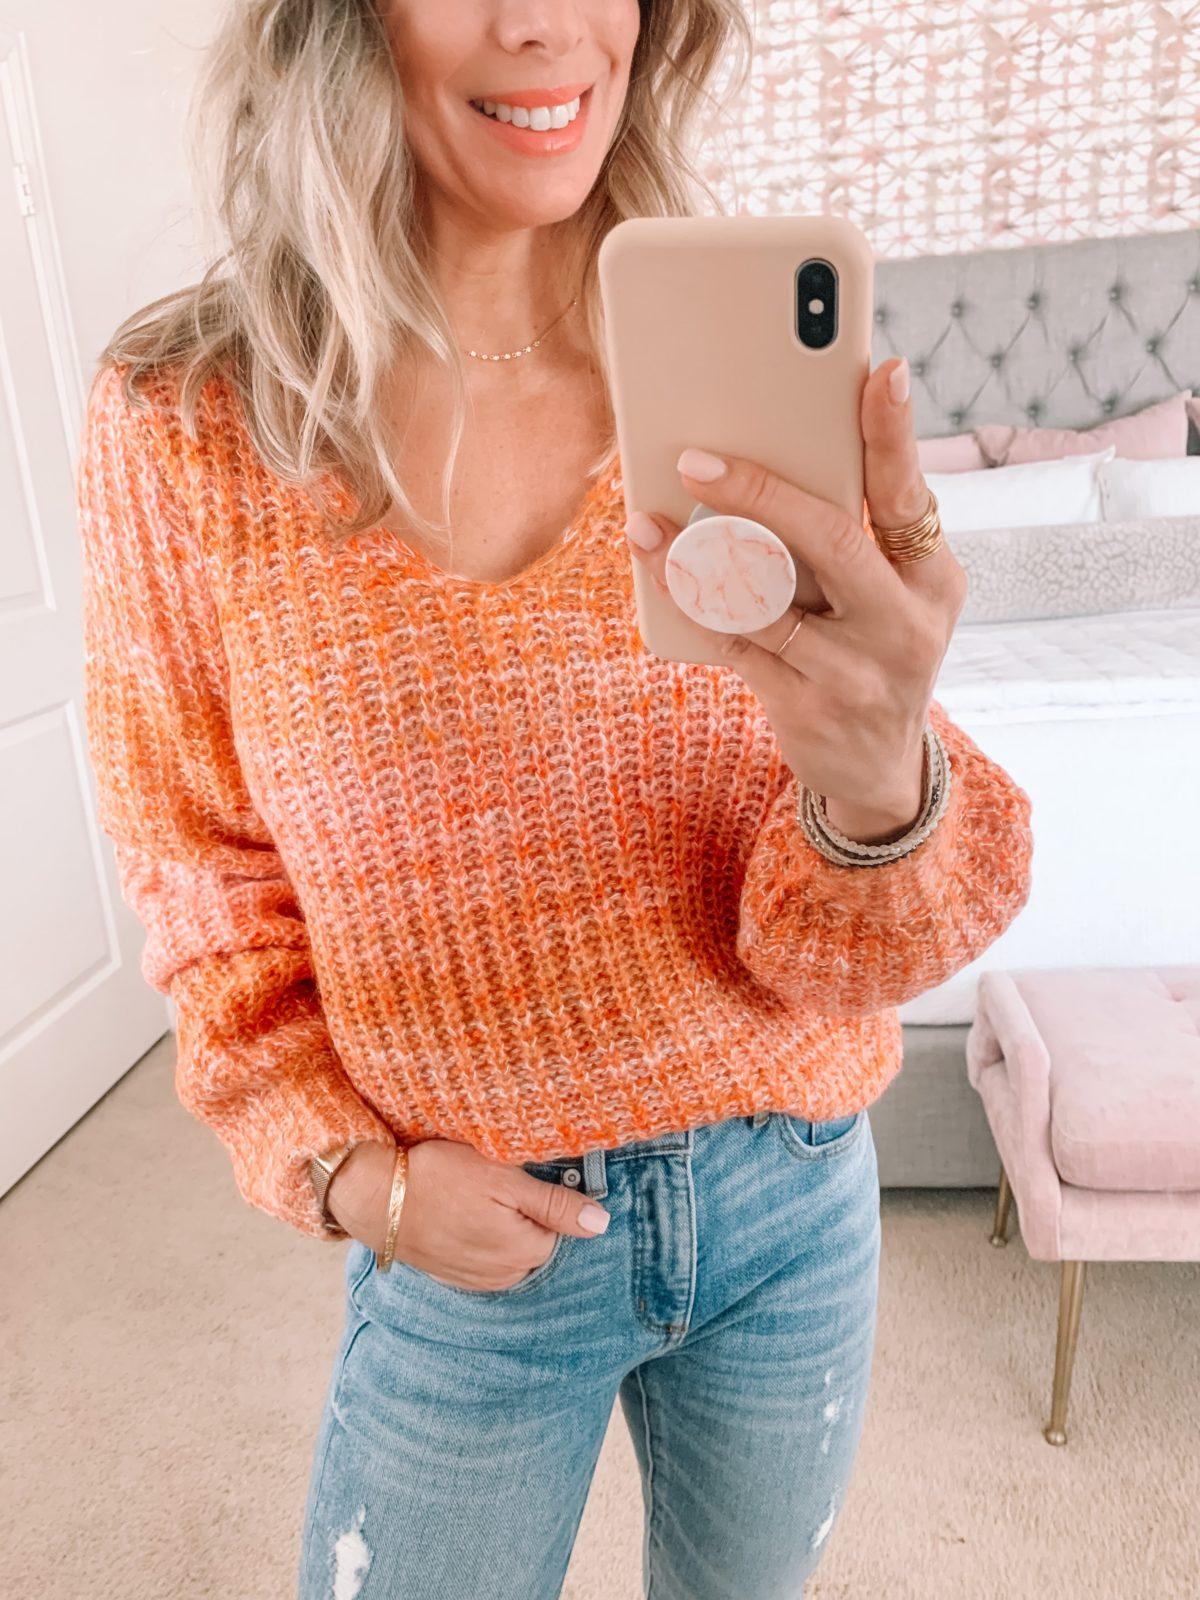 Dressing Room Finds, Orange Sweater, Jeans